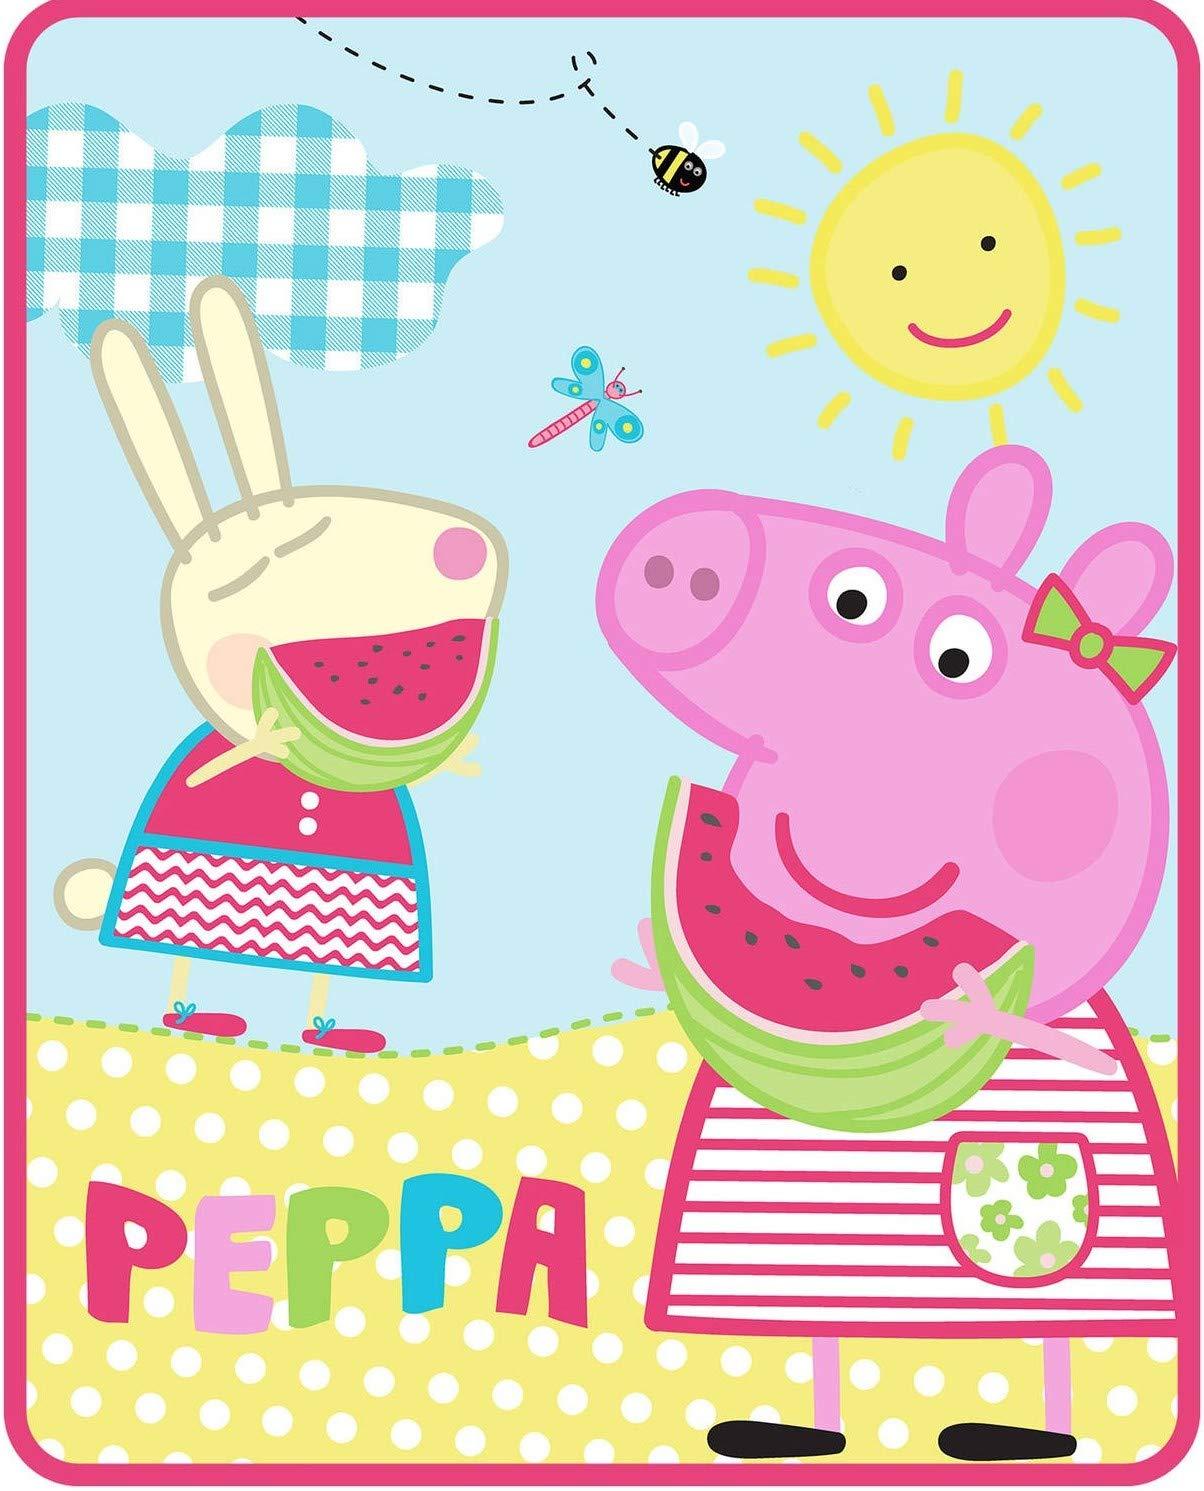 Astley Baker Davies Peppa Pig Silky Soft Throw Blanket - 40 in. x 50 in.,Multi by Franco